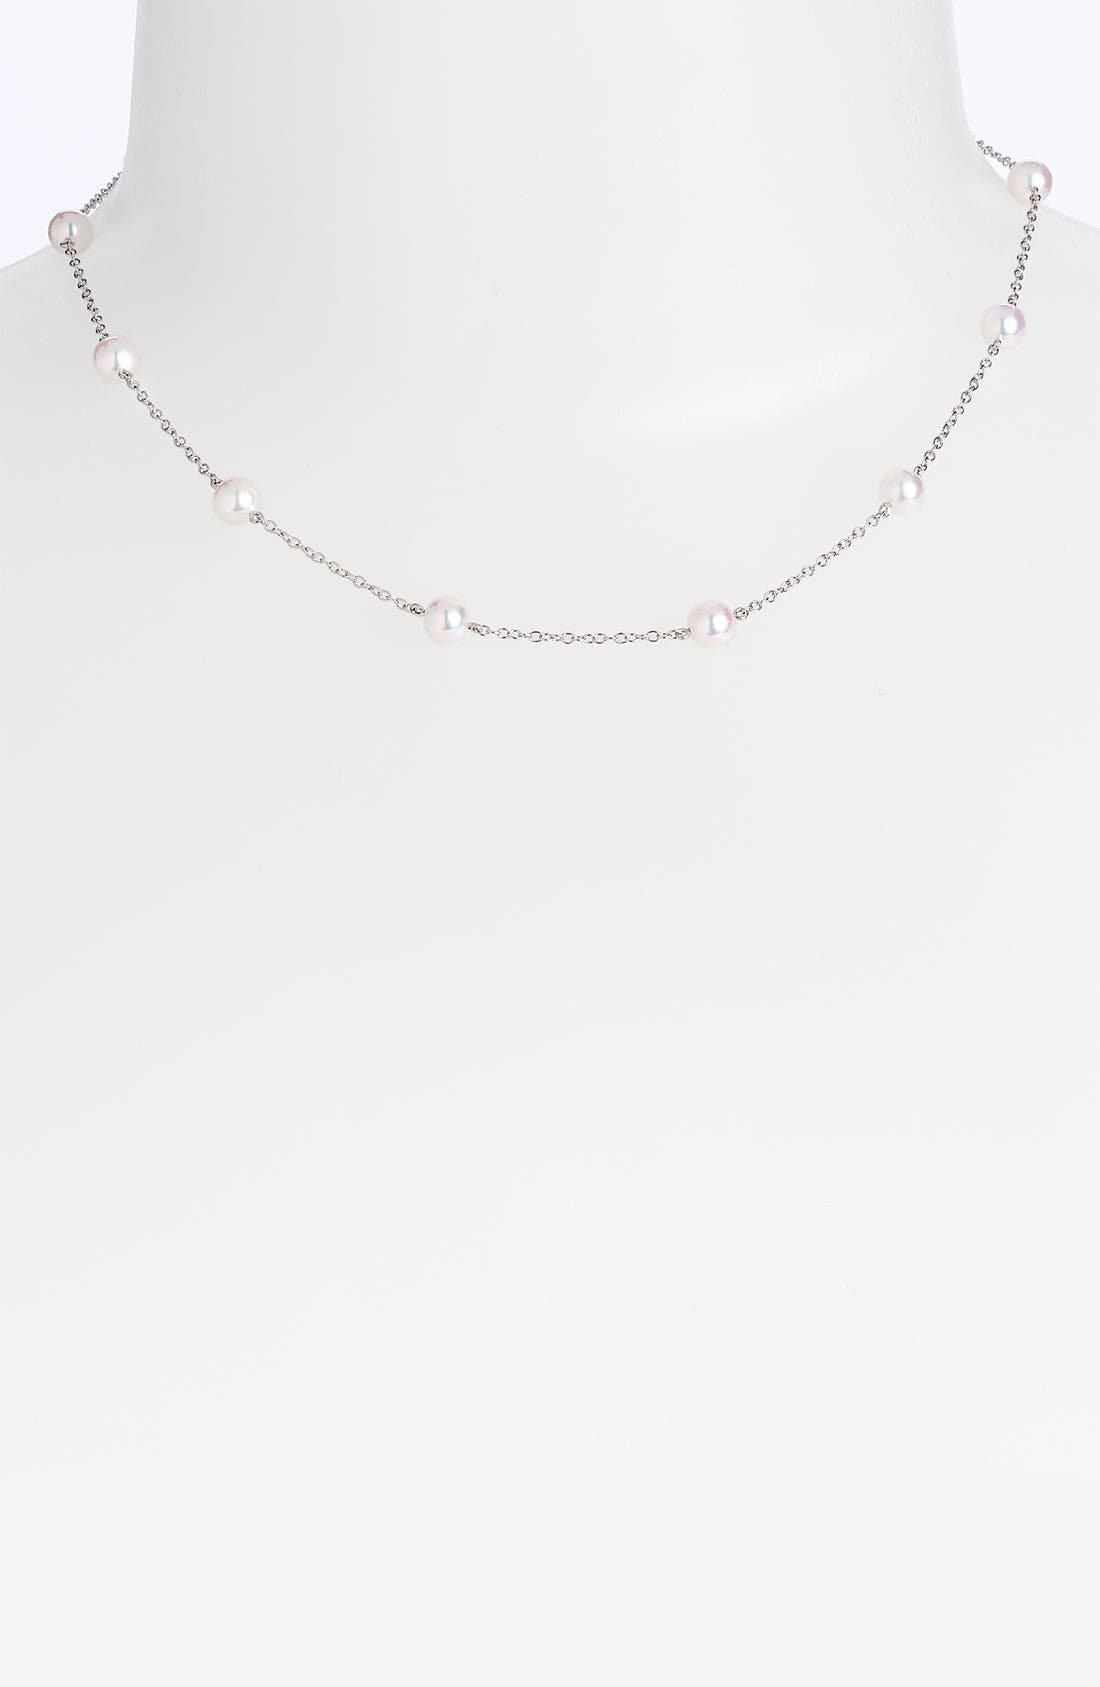 Main Image - Mikimoto Akoya Cultured Pearl & Chain Necklace